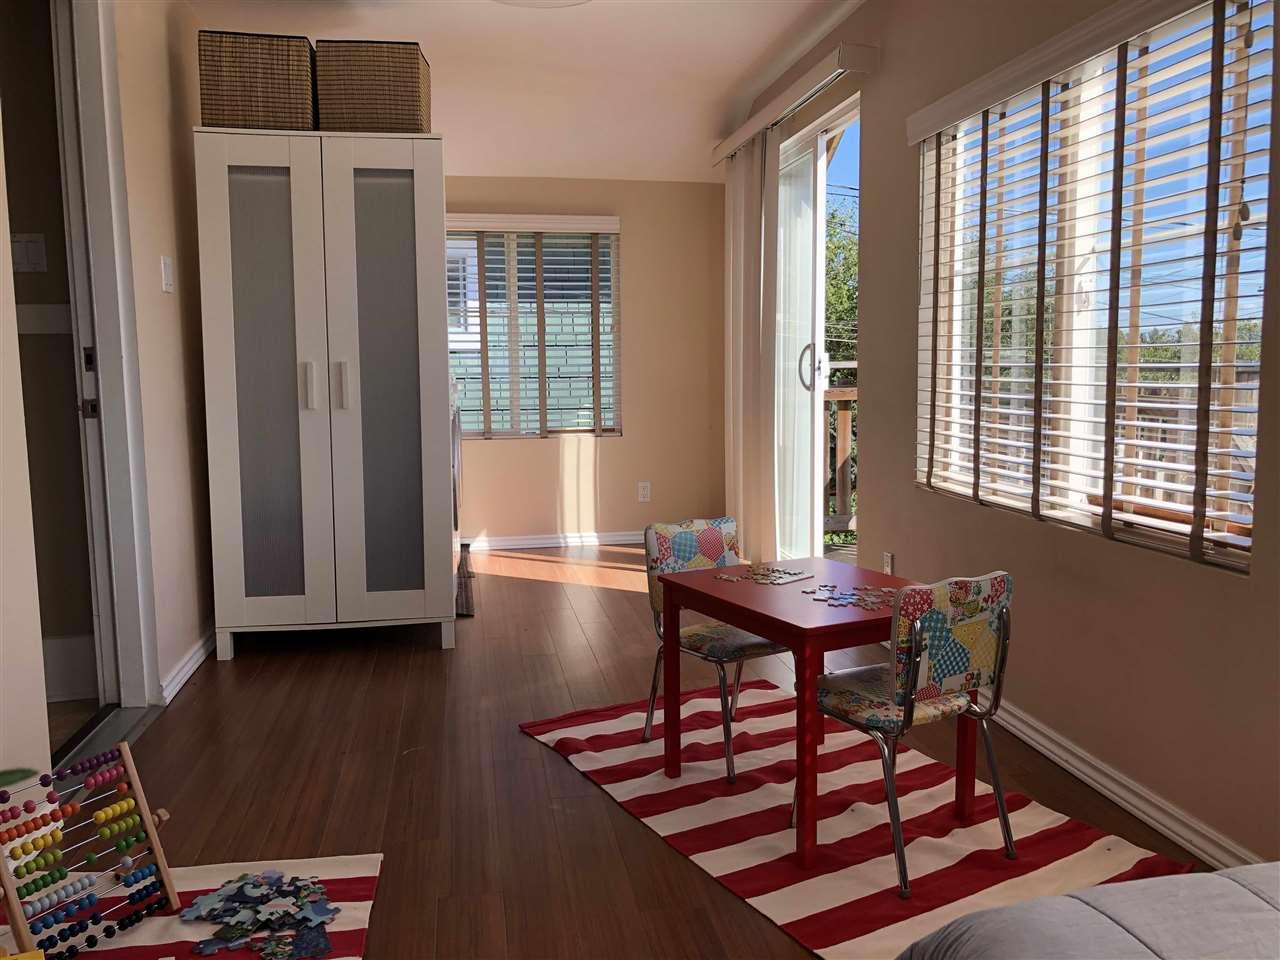 2684 TURNER STREET - Hastings Sunrise House/Single Family for sale, 5 Bedrooms (R2497817) - #19